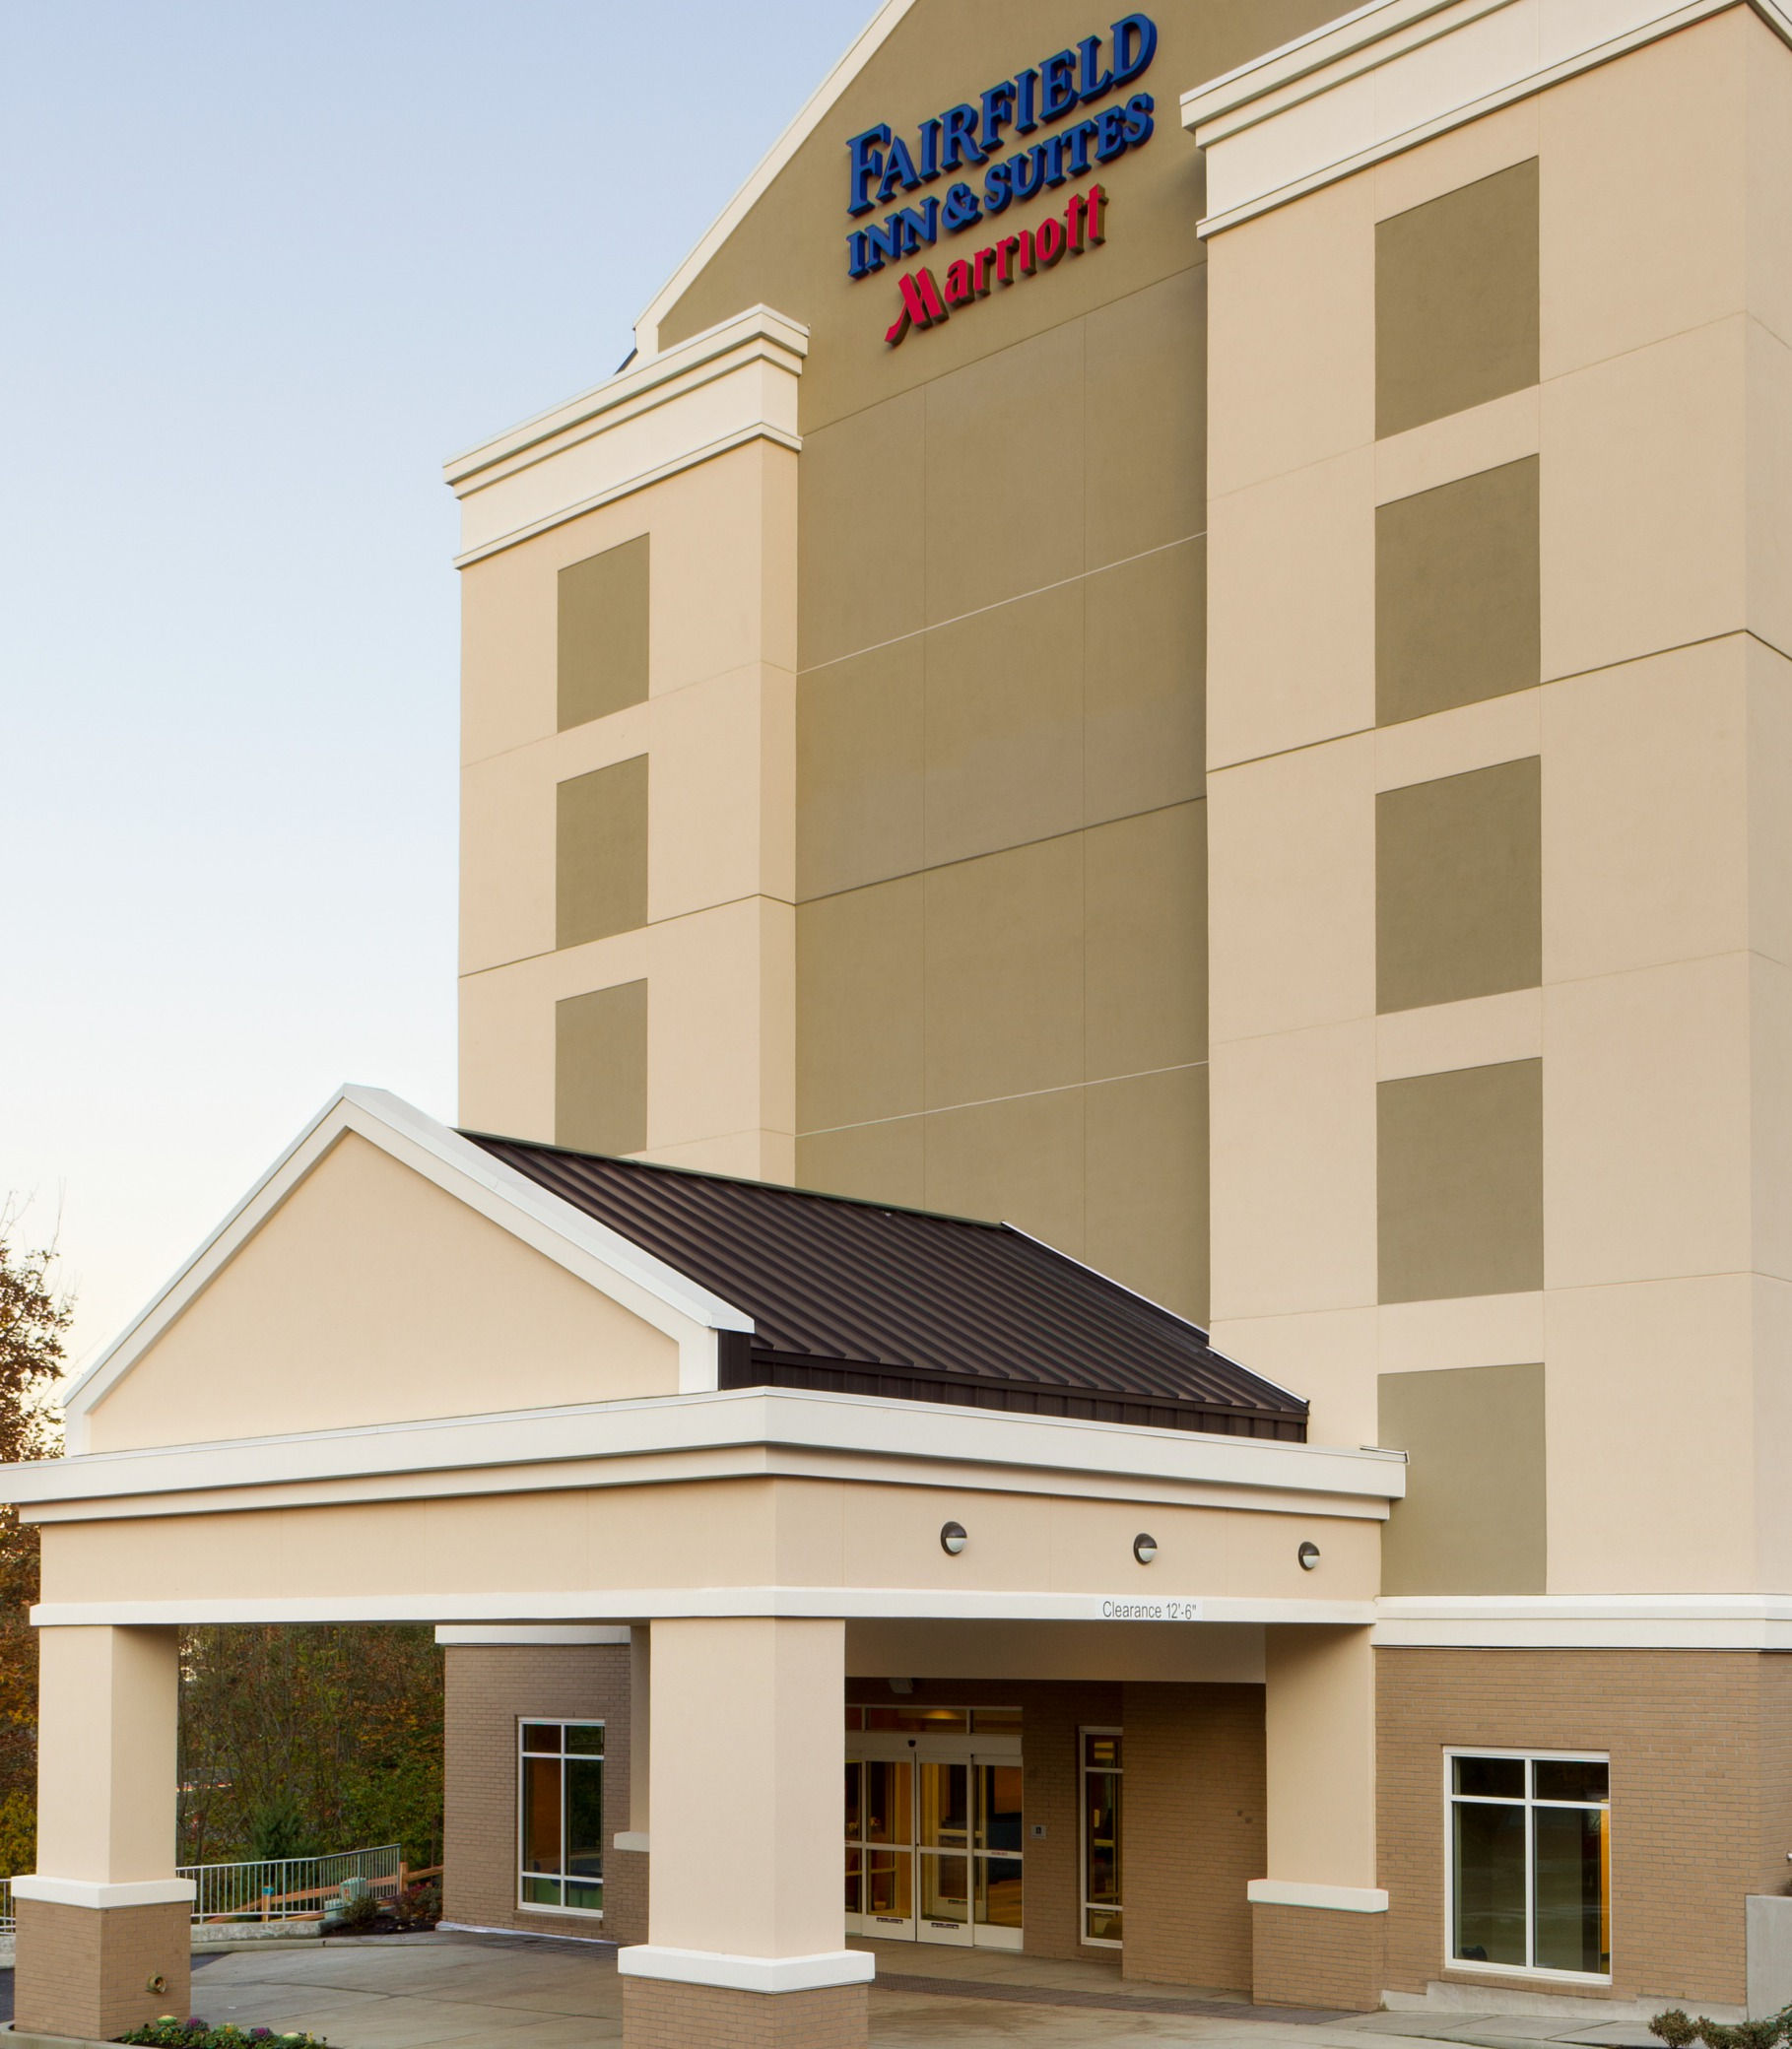 Fairfield Inn & Suites by Marriott Tacoma Puyallup image 1